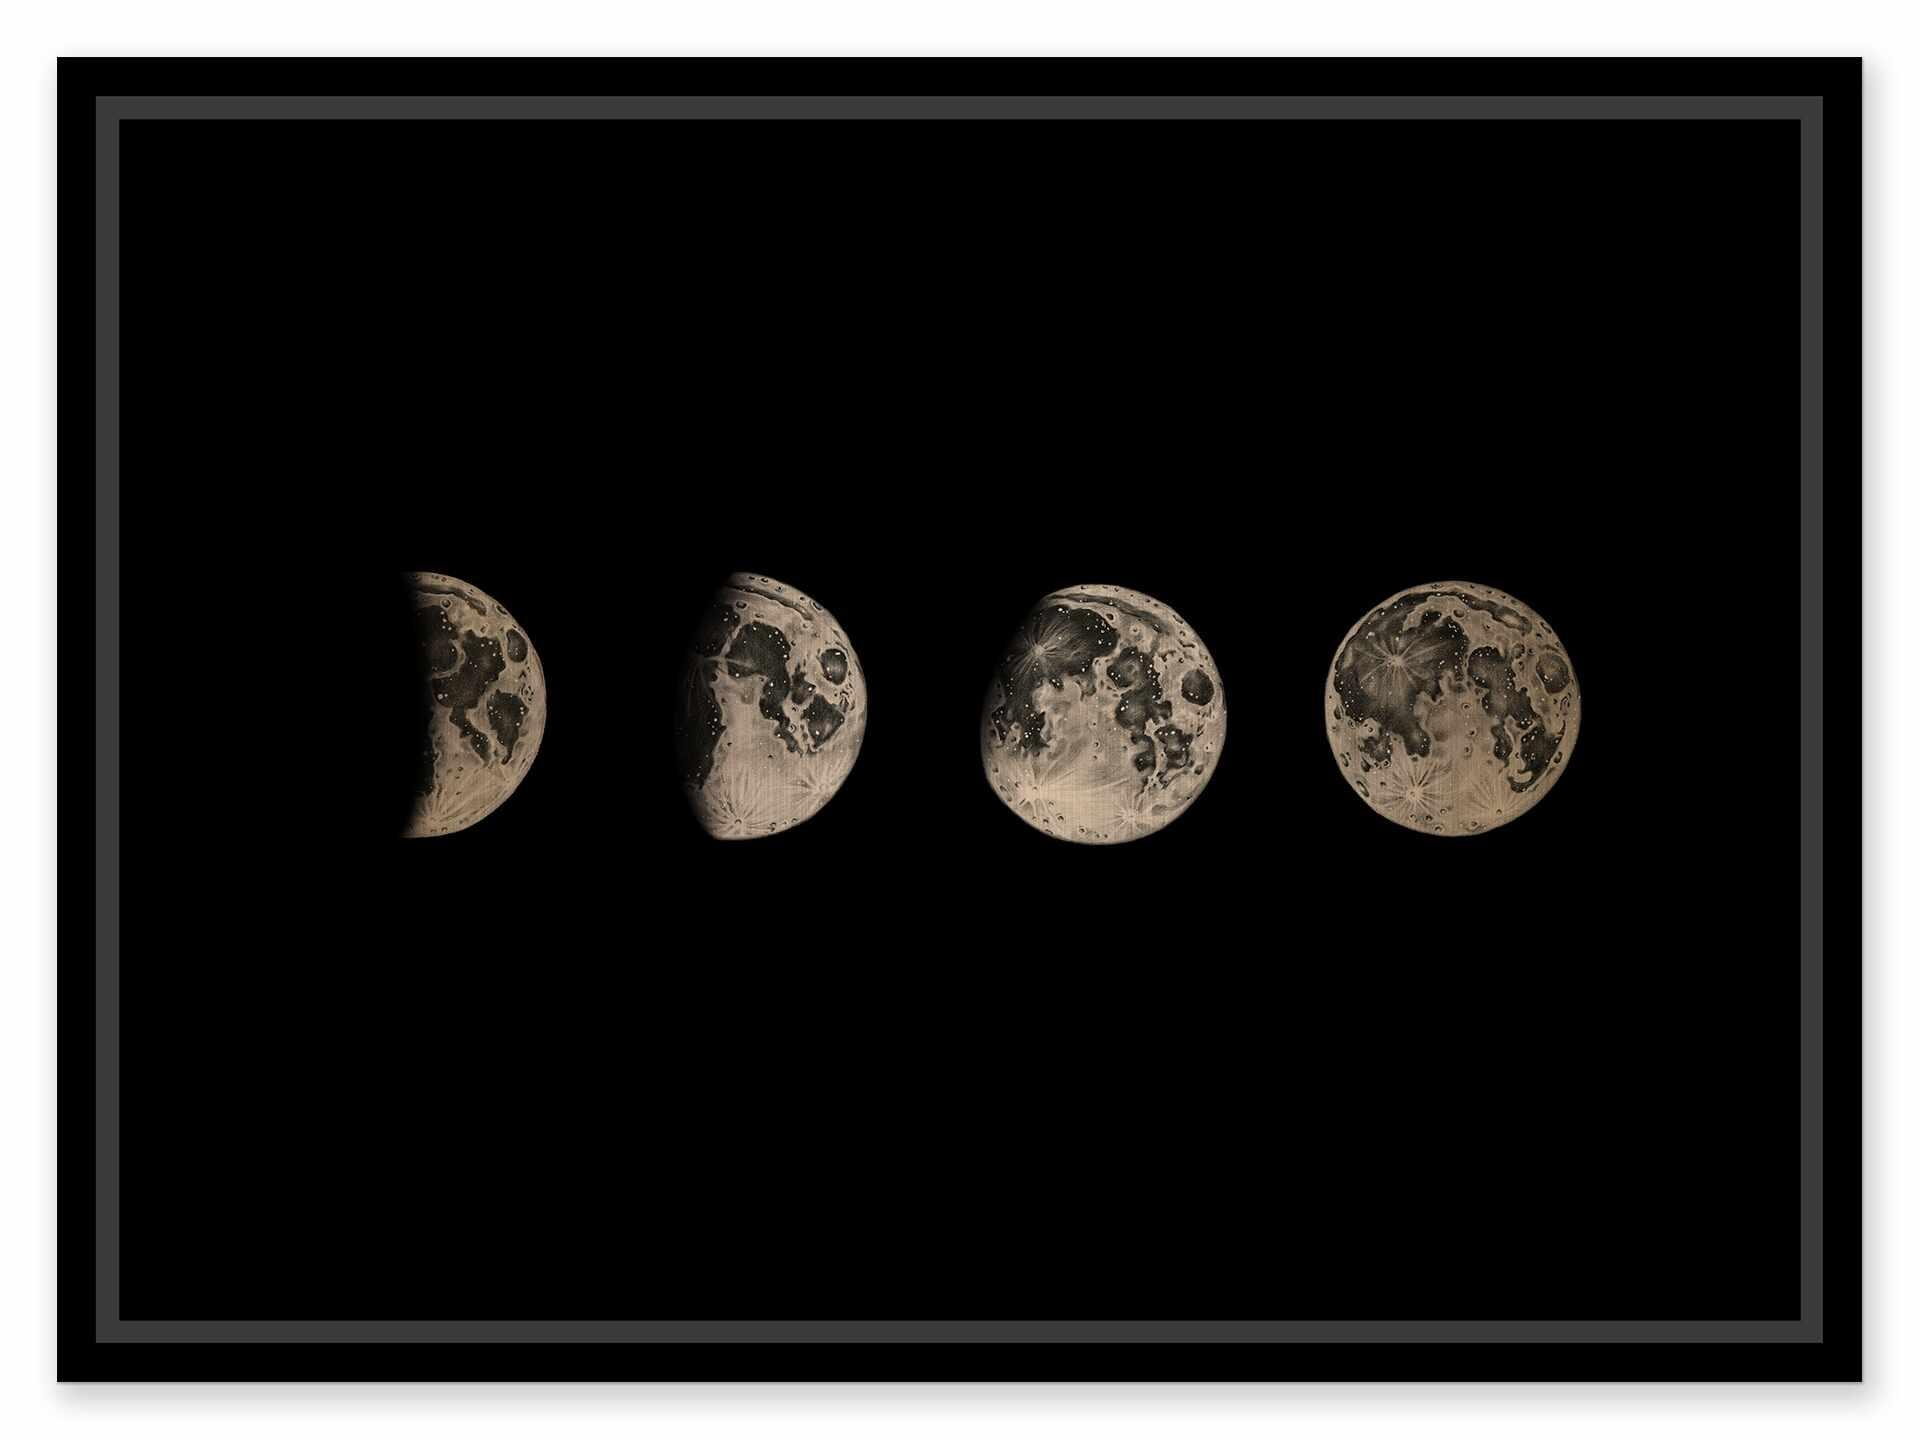 Tablou pe metal striat aramiu Moon Phases la pret 643 lei